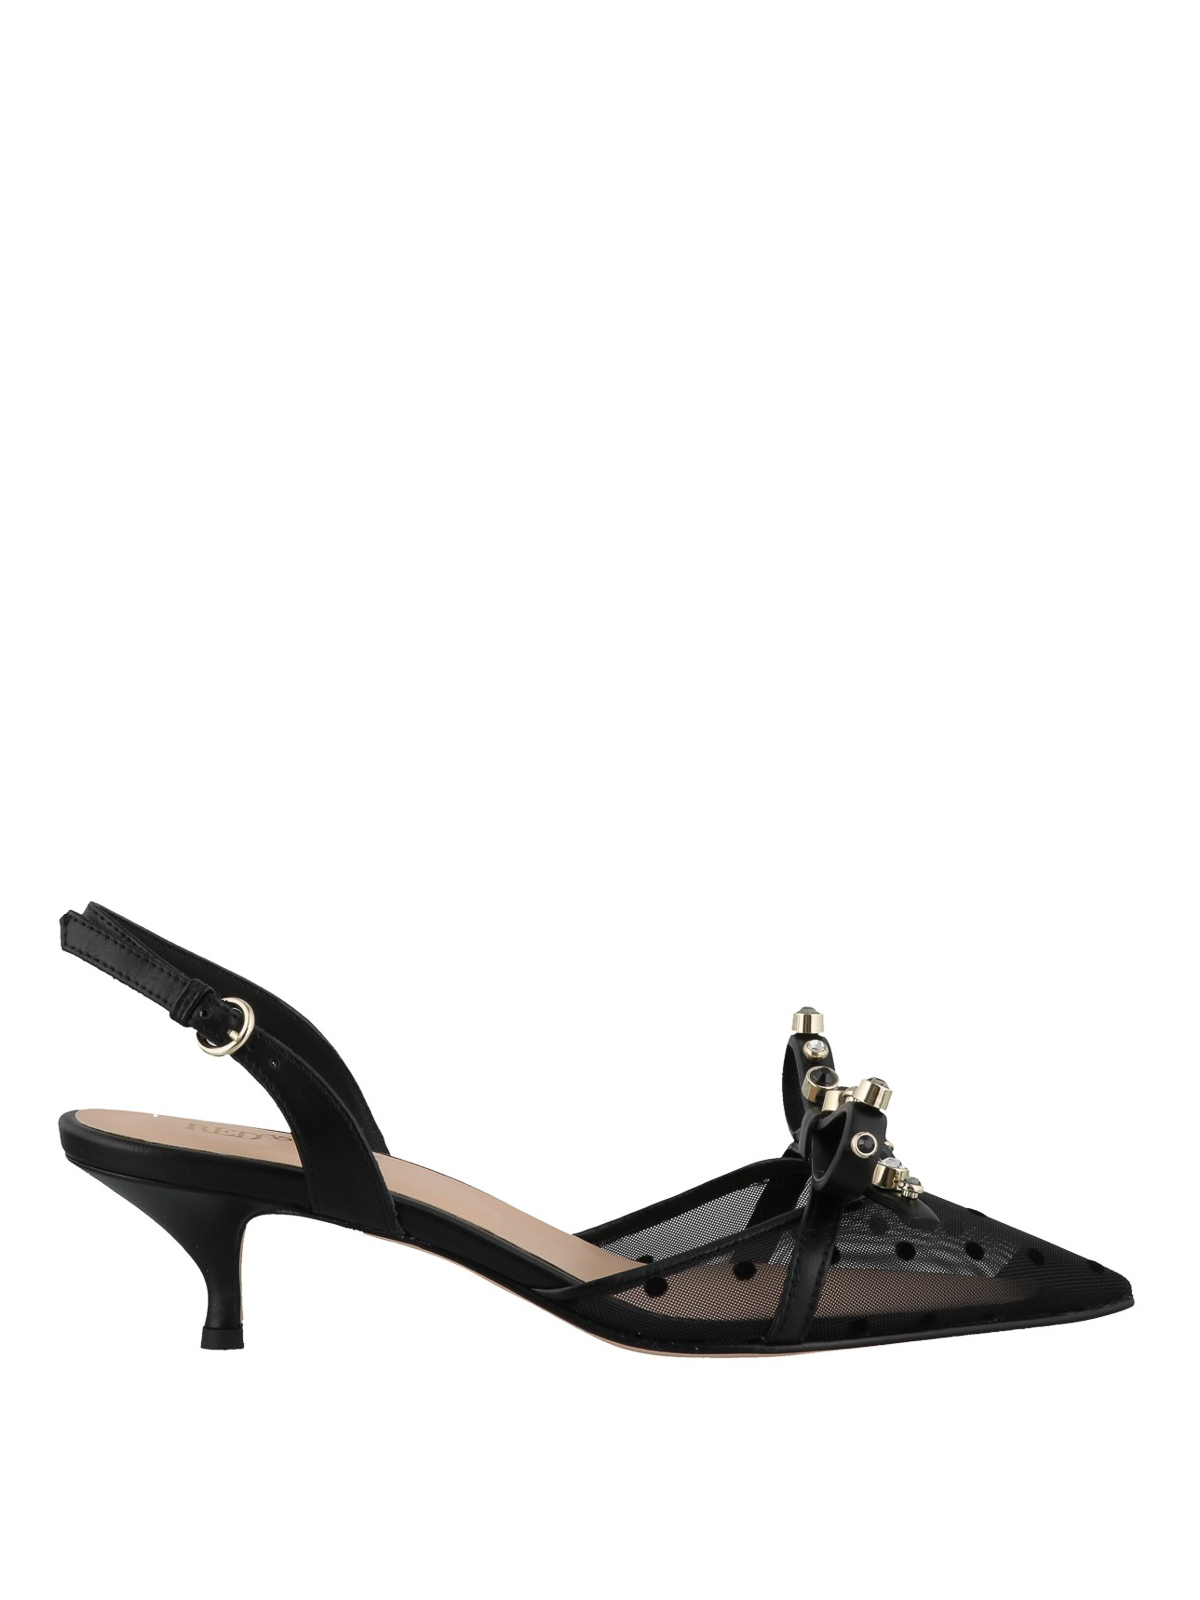 b583456f26a73 Valentino Red - Black polka dot slingbacks - court shoes ...